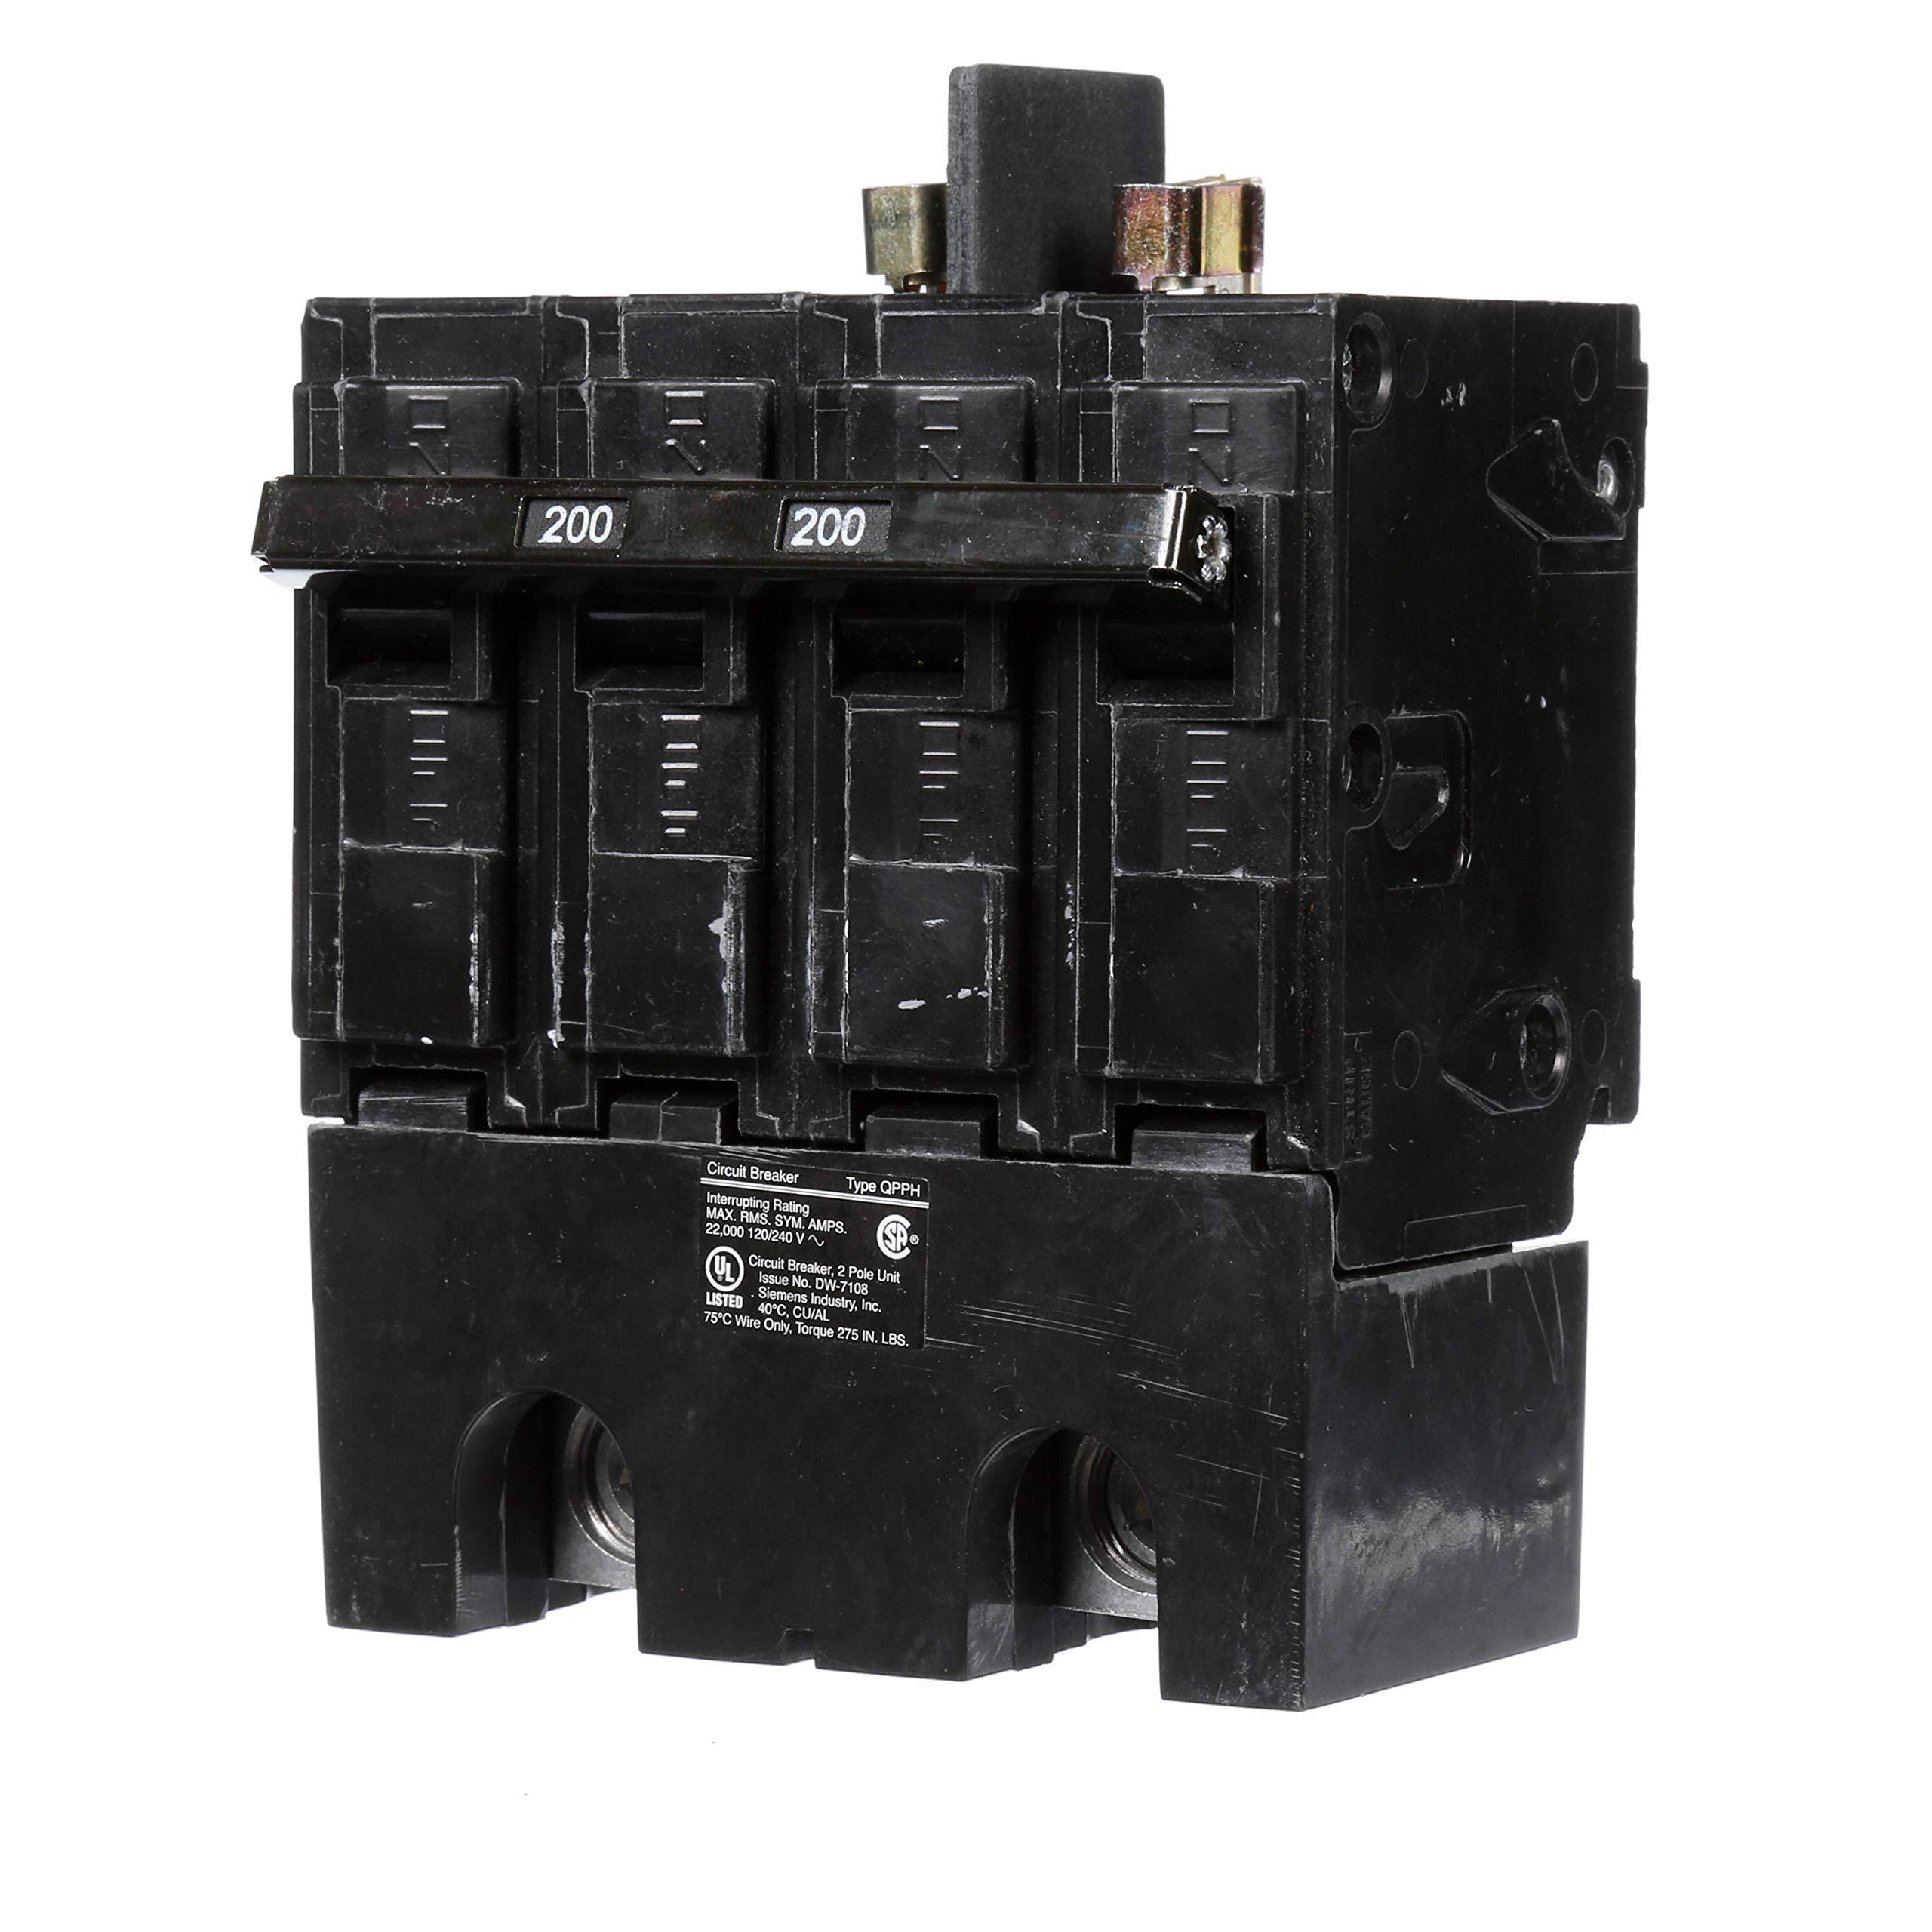 Siemens Q2200BH 200A 4 Pole 120/240-Volt 22K type QPPH Circuit Breaker